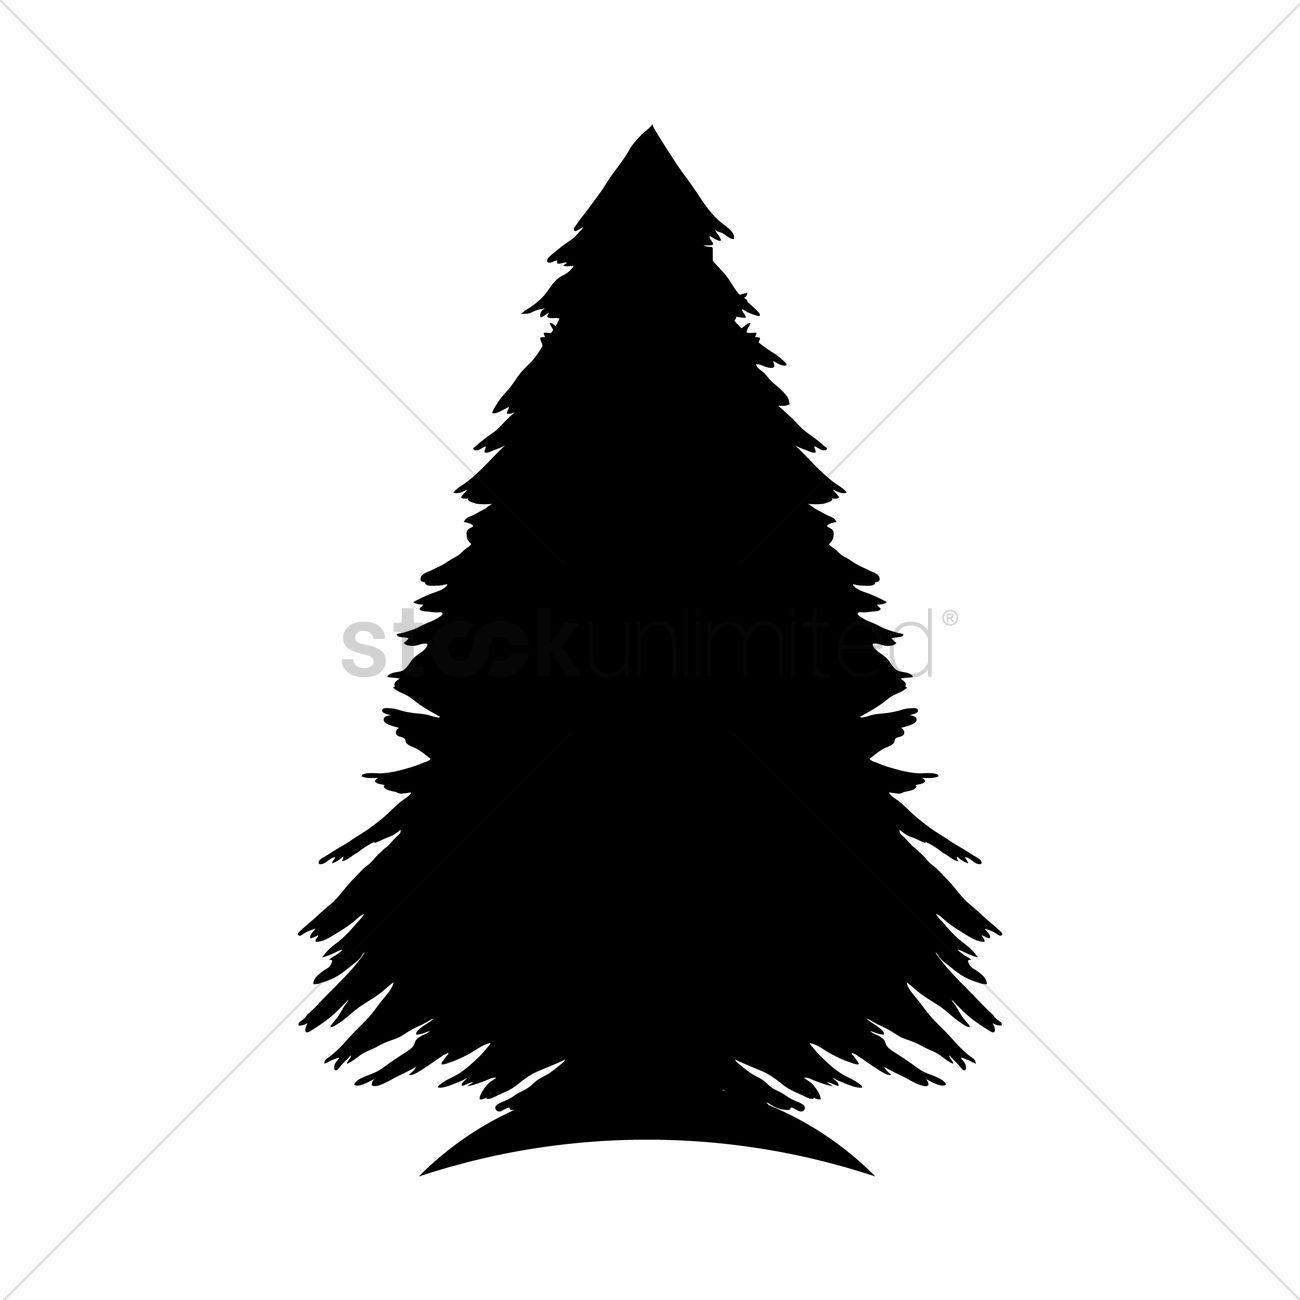 1300x1300 Pine Tree Silhouette Vector Image